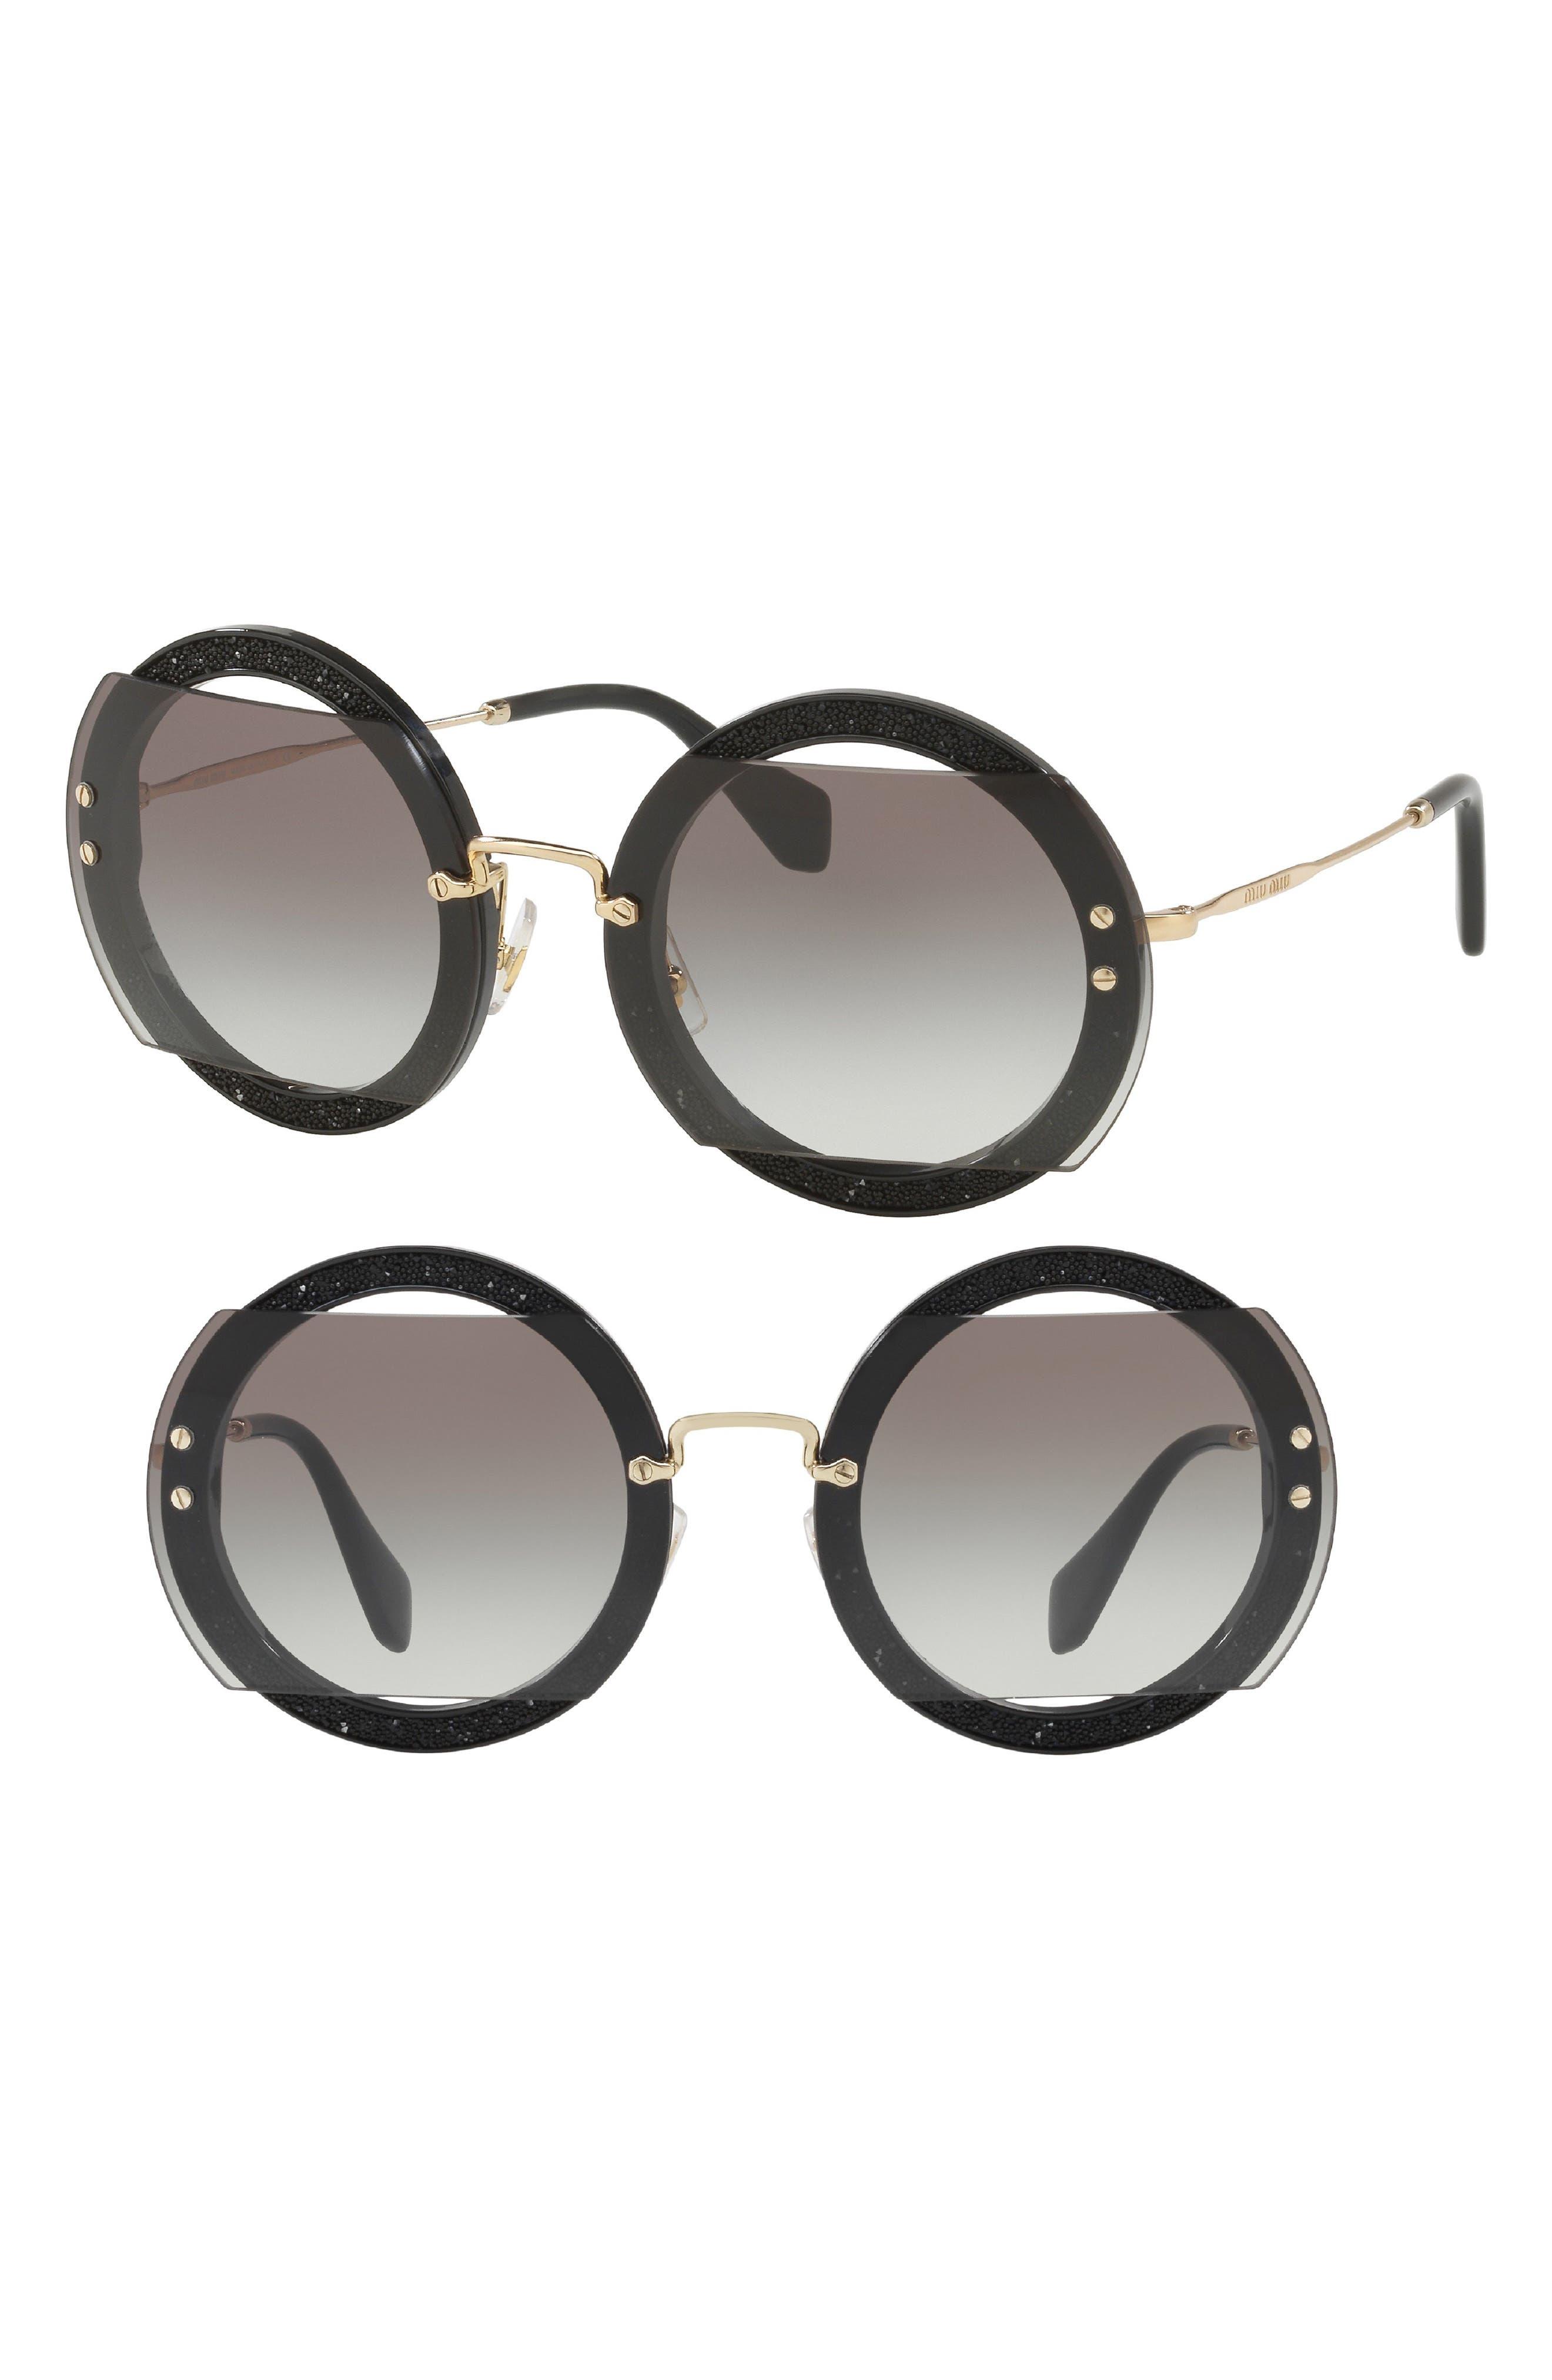 Miu Miu 63mm Retro Oversize Sunglasses